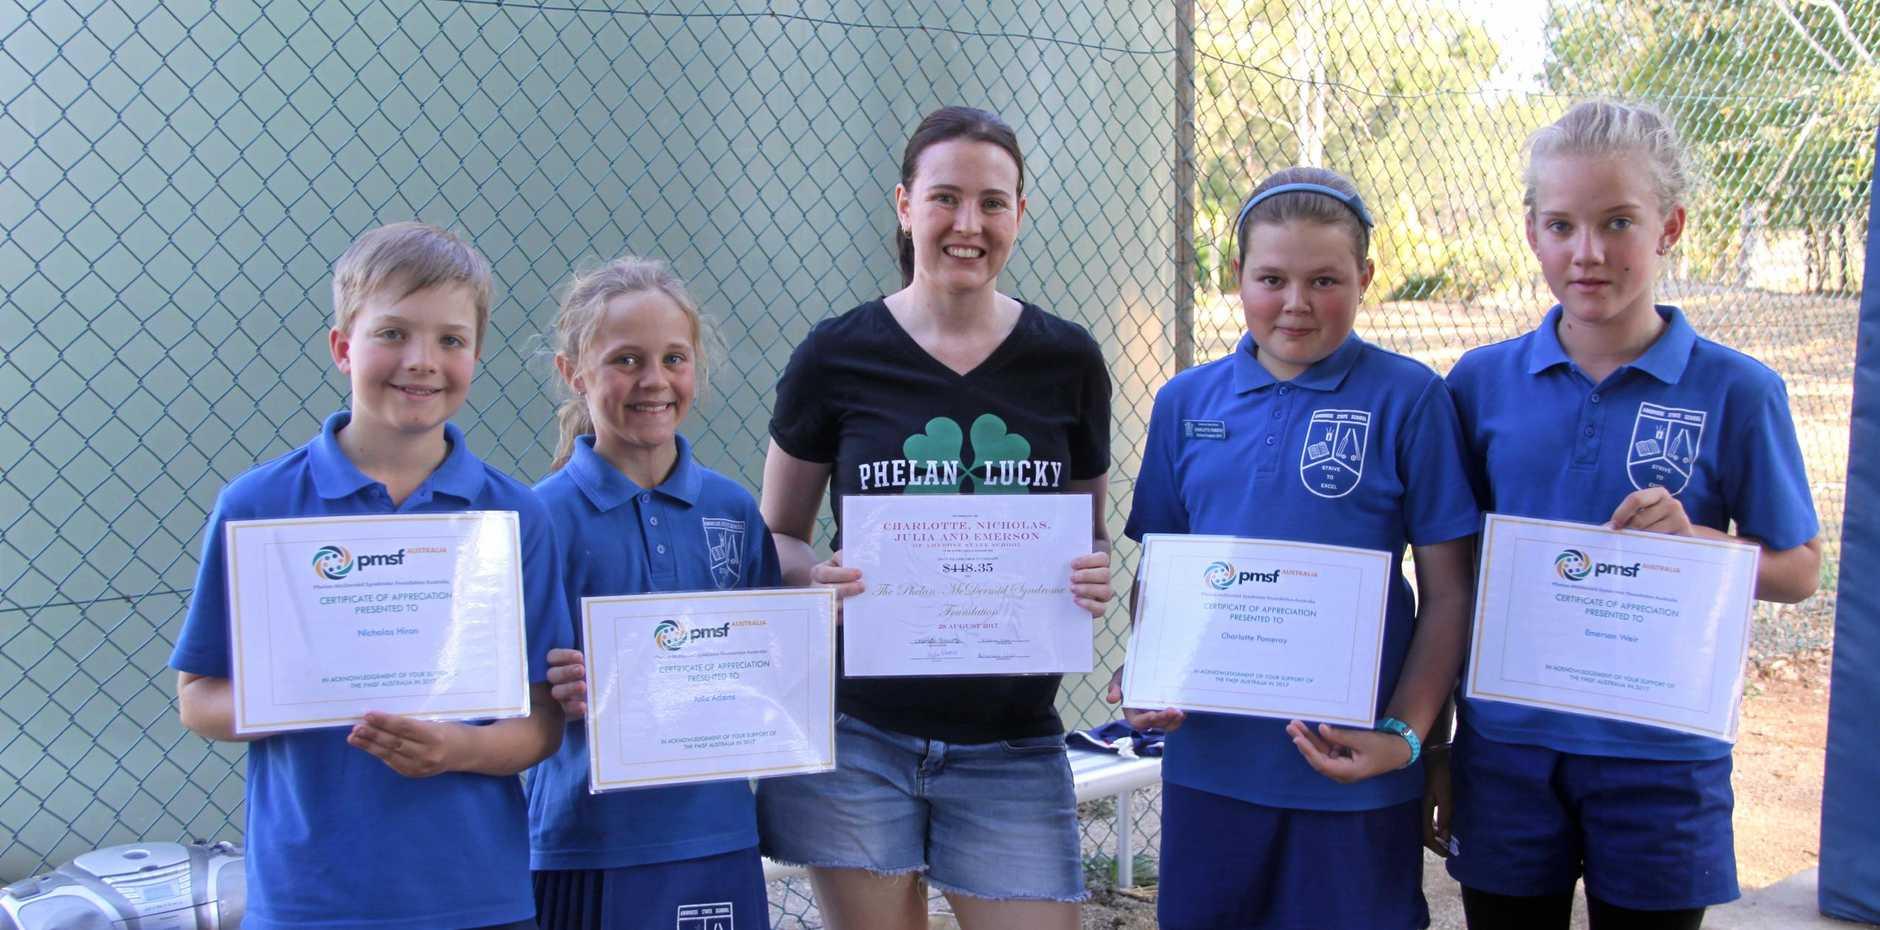 GREAT WORK: Nicholas Hiron, Julia Adams, Katelyn Hannant, Charlotte Pomeroy and Emerson Weir raised money for the Phelan-McDermid Syndrome Foundation.